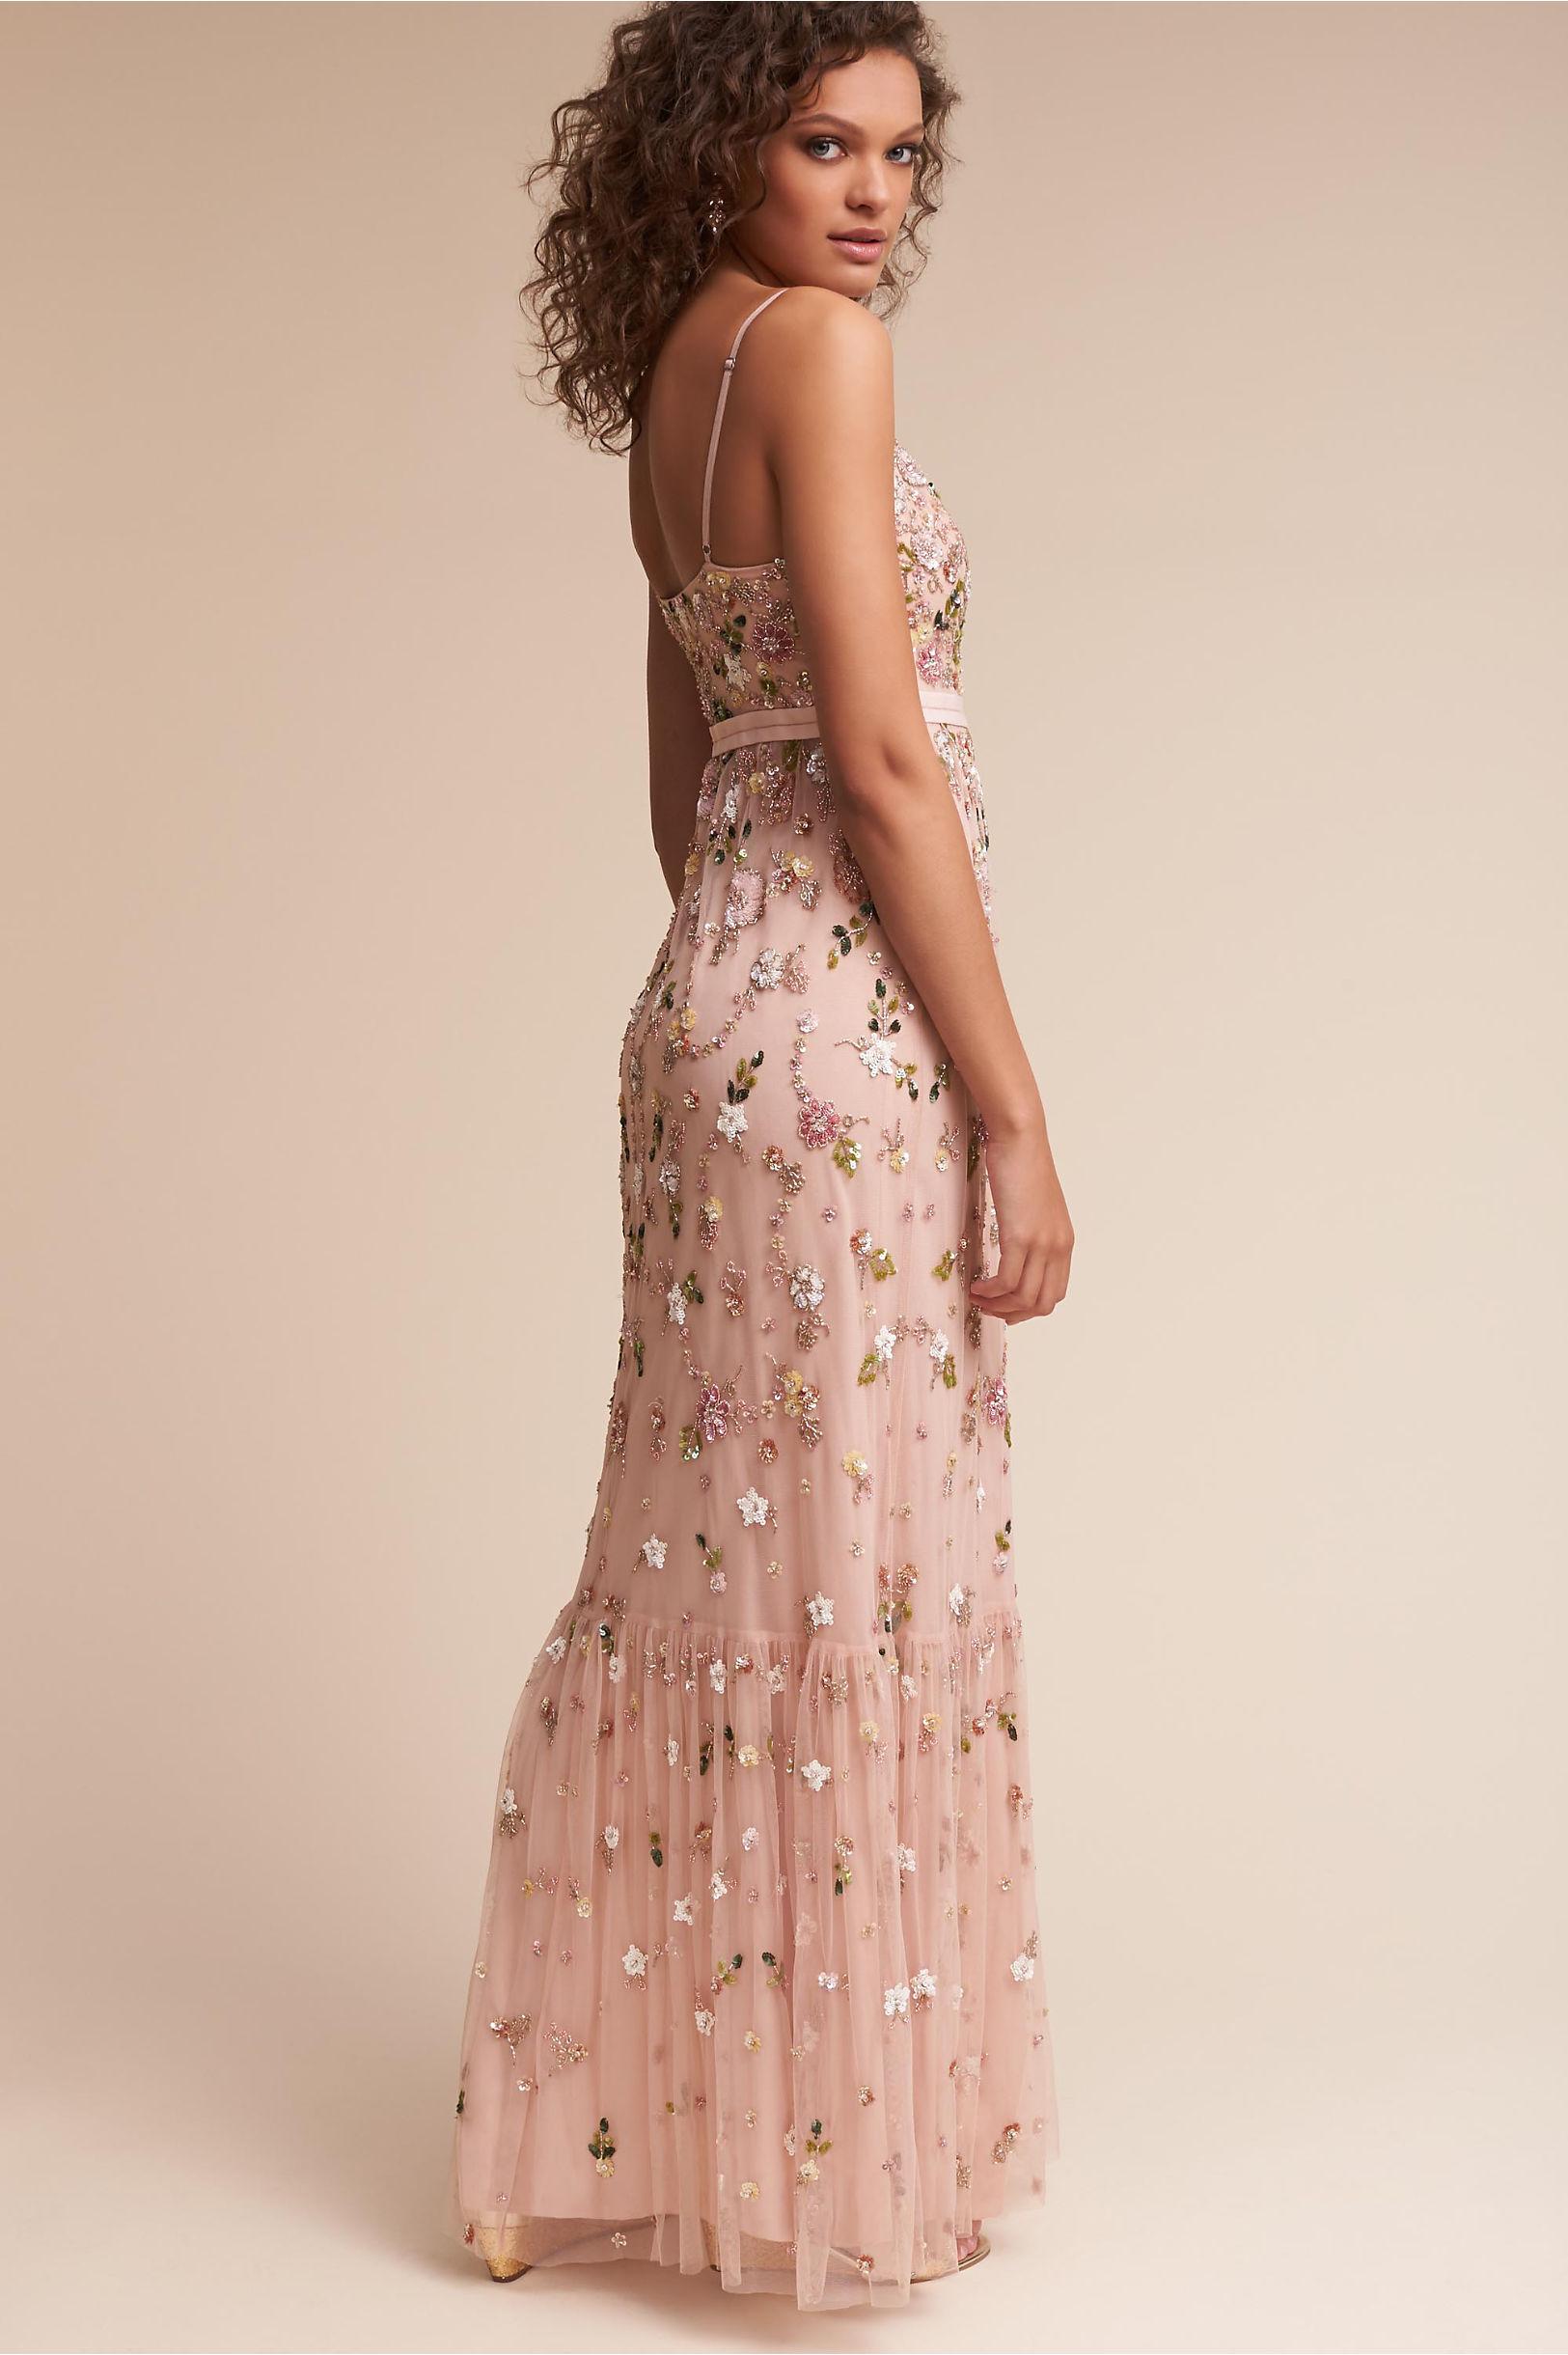 Kimya dress in sale bhldn needle thread blossom pink kimya dress bhldn ombrellifo Image collections